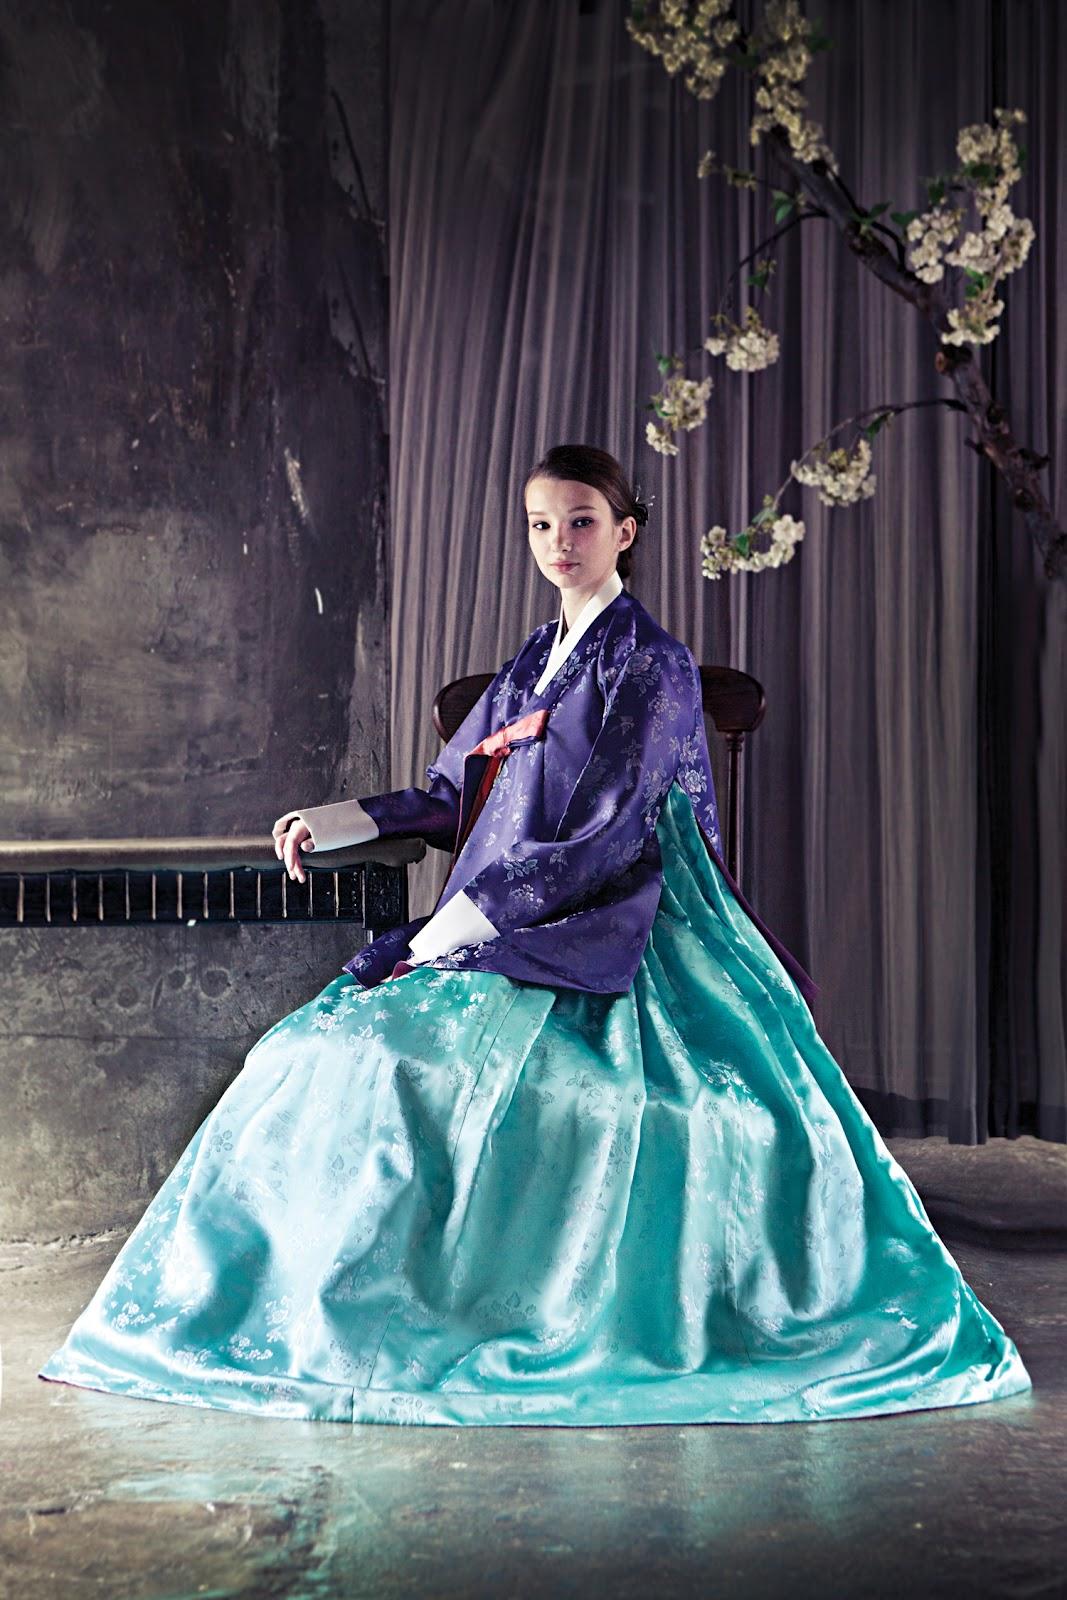 Bombic and luxurious Larisa Guzeeva caused delight in Instagram 29.12.2017 92